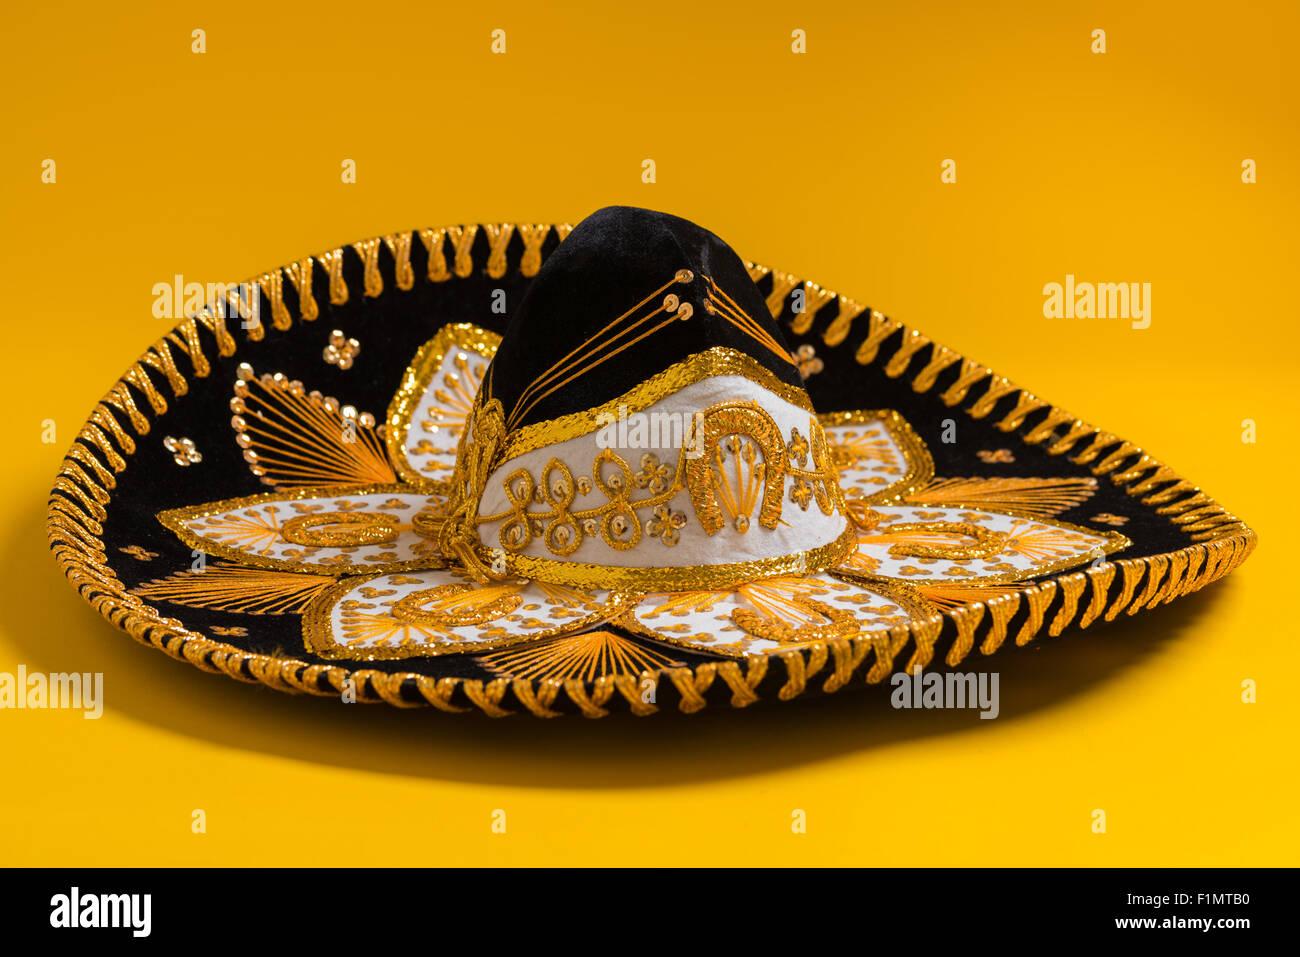 Black Sombrero Imágenes De Stock   Black Sombrero Fotos De Stock - Alamy 343b627e49b7